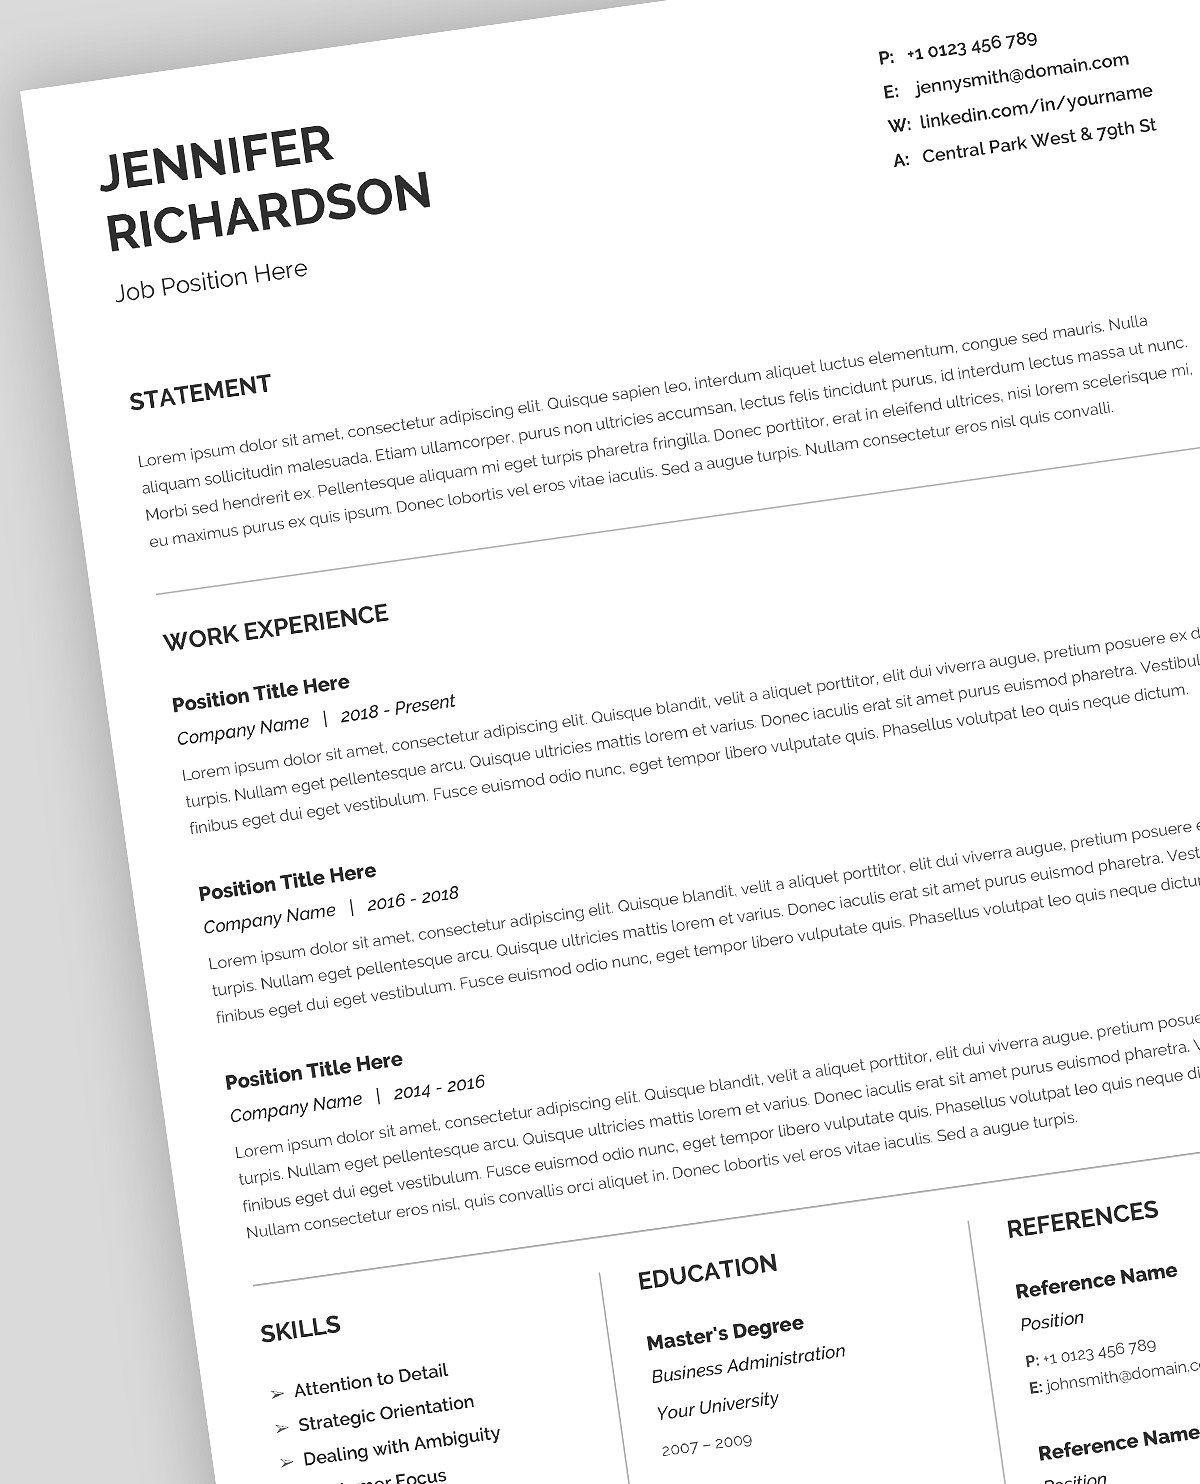 Resume Template, CV, Google Docs editOSsimpleresume